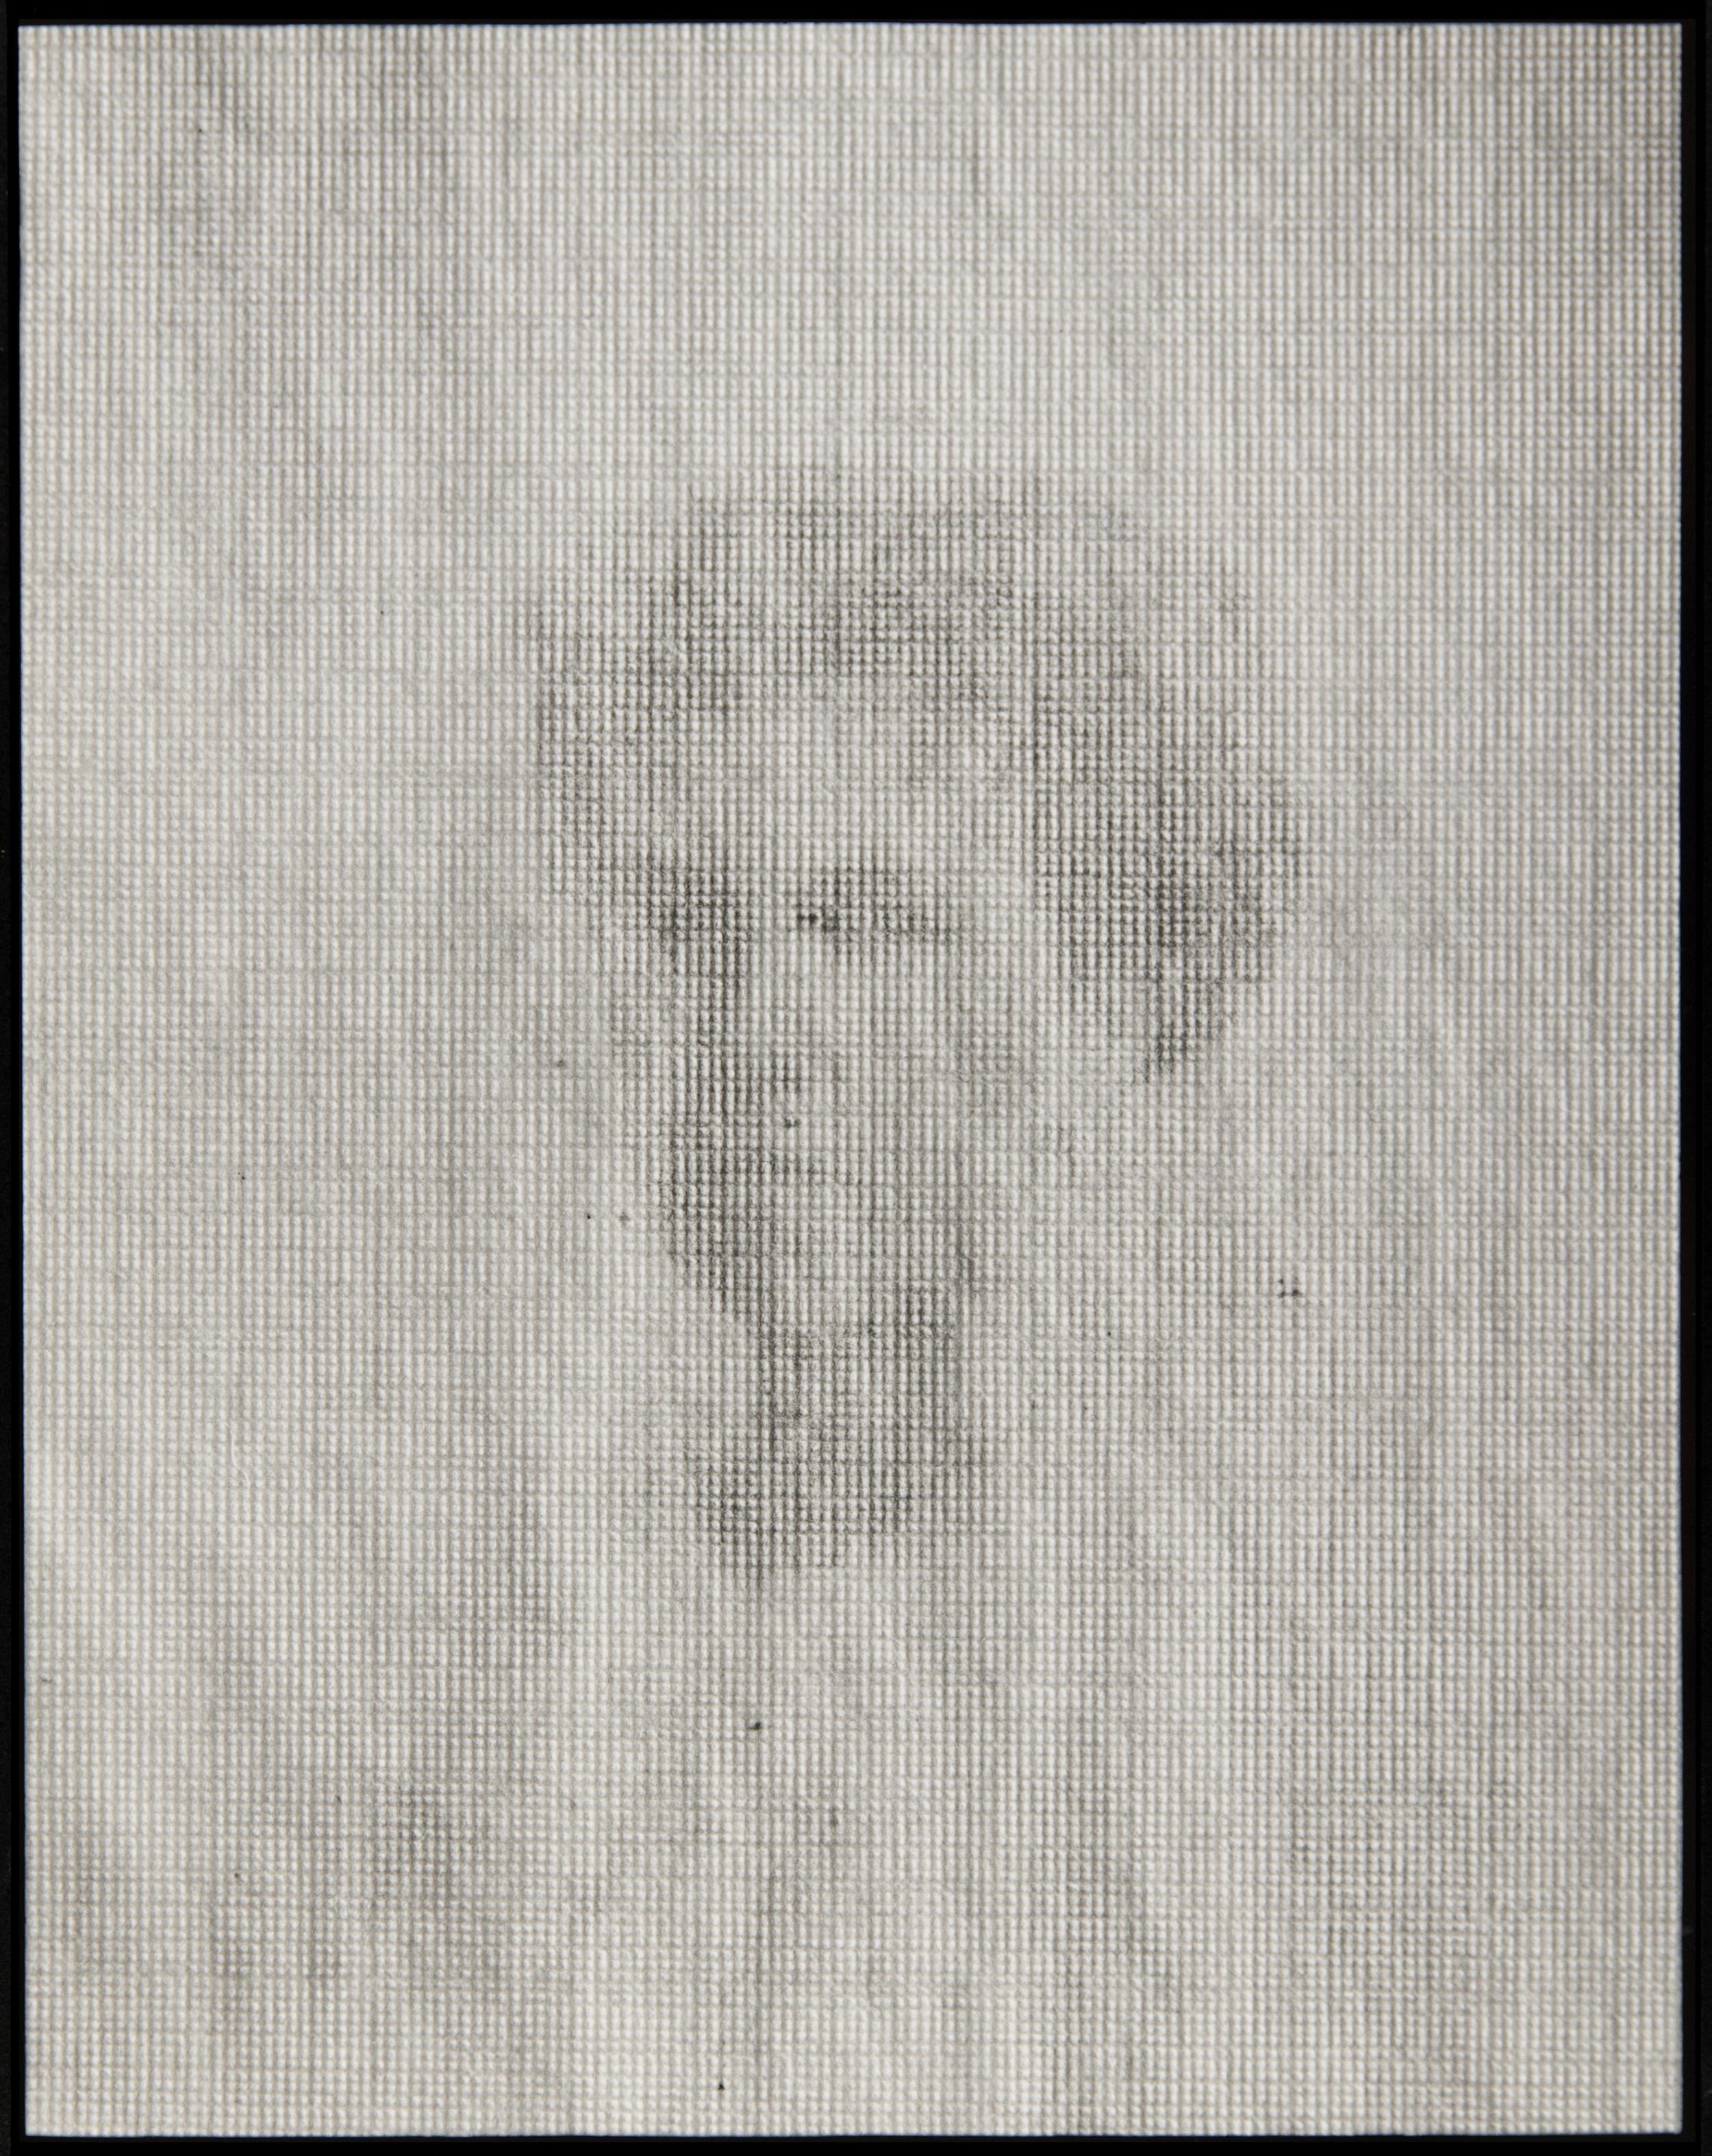 06-Tissue.jpg